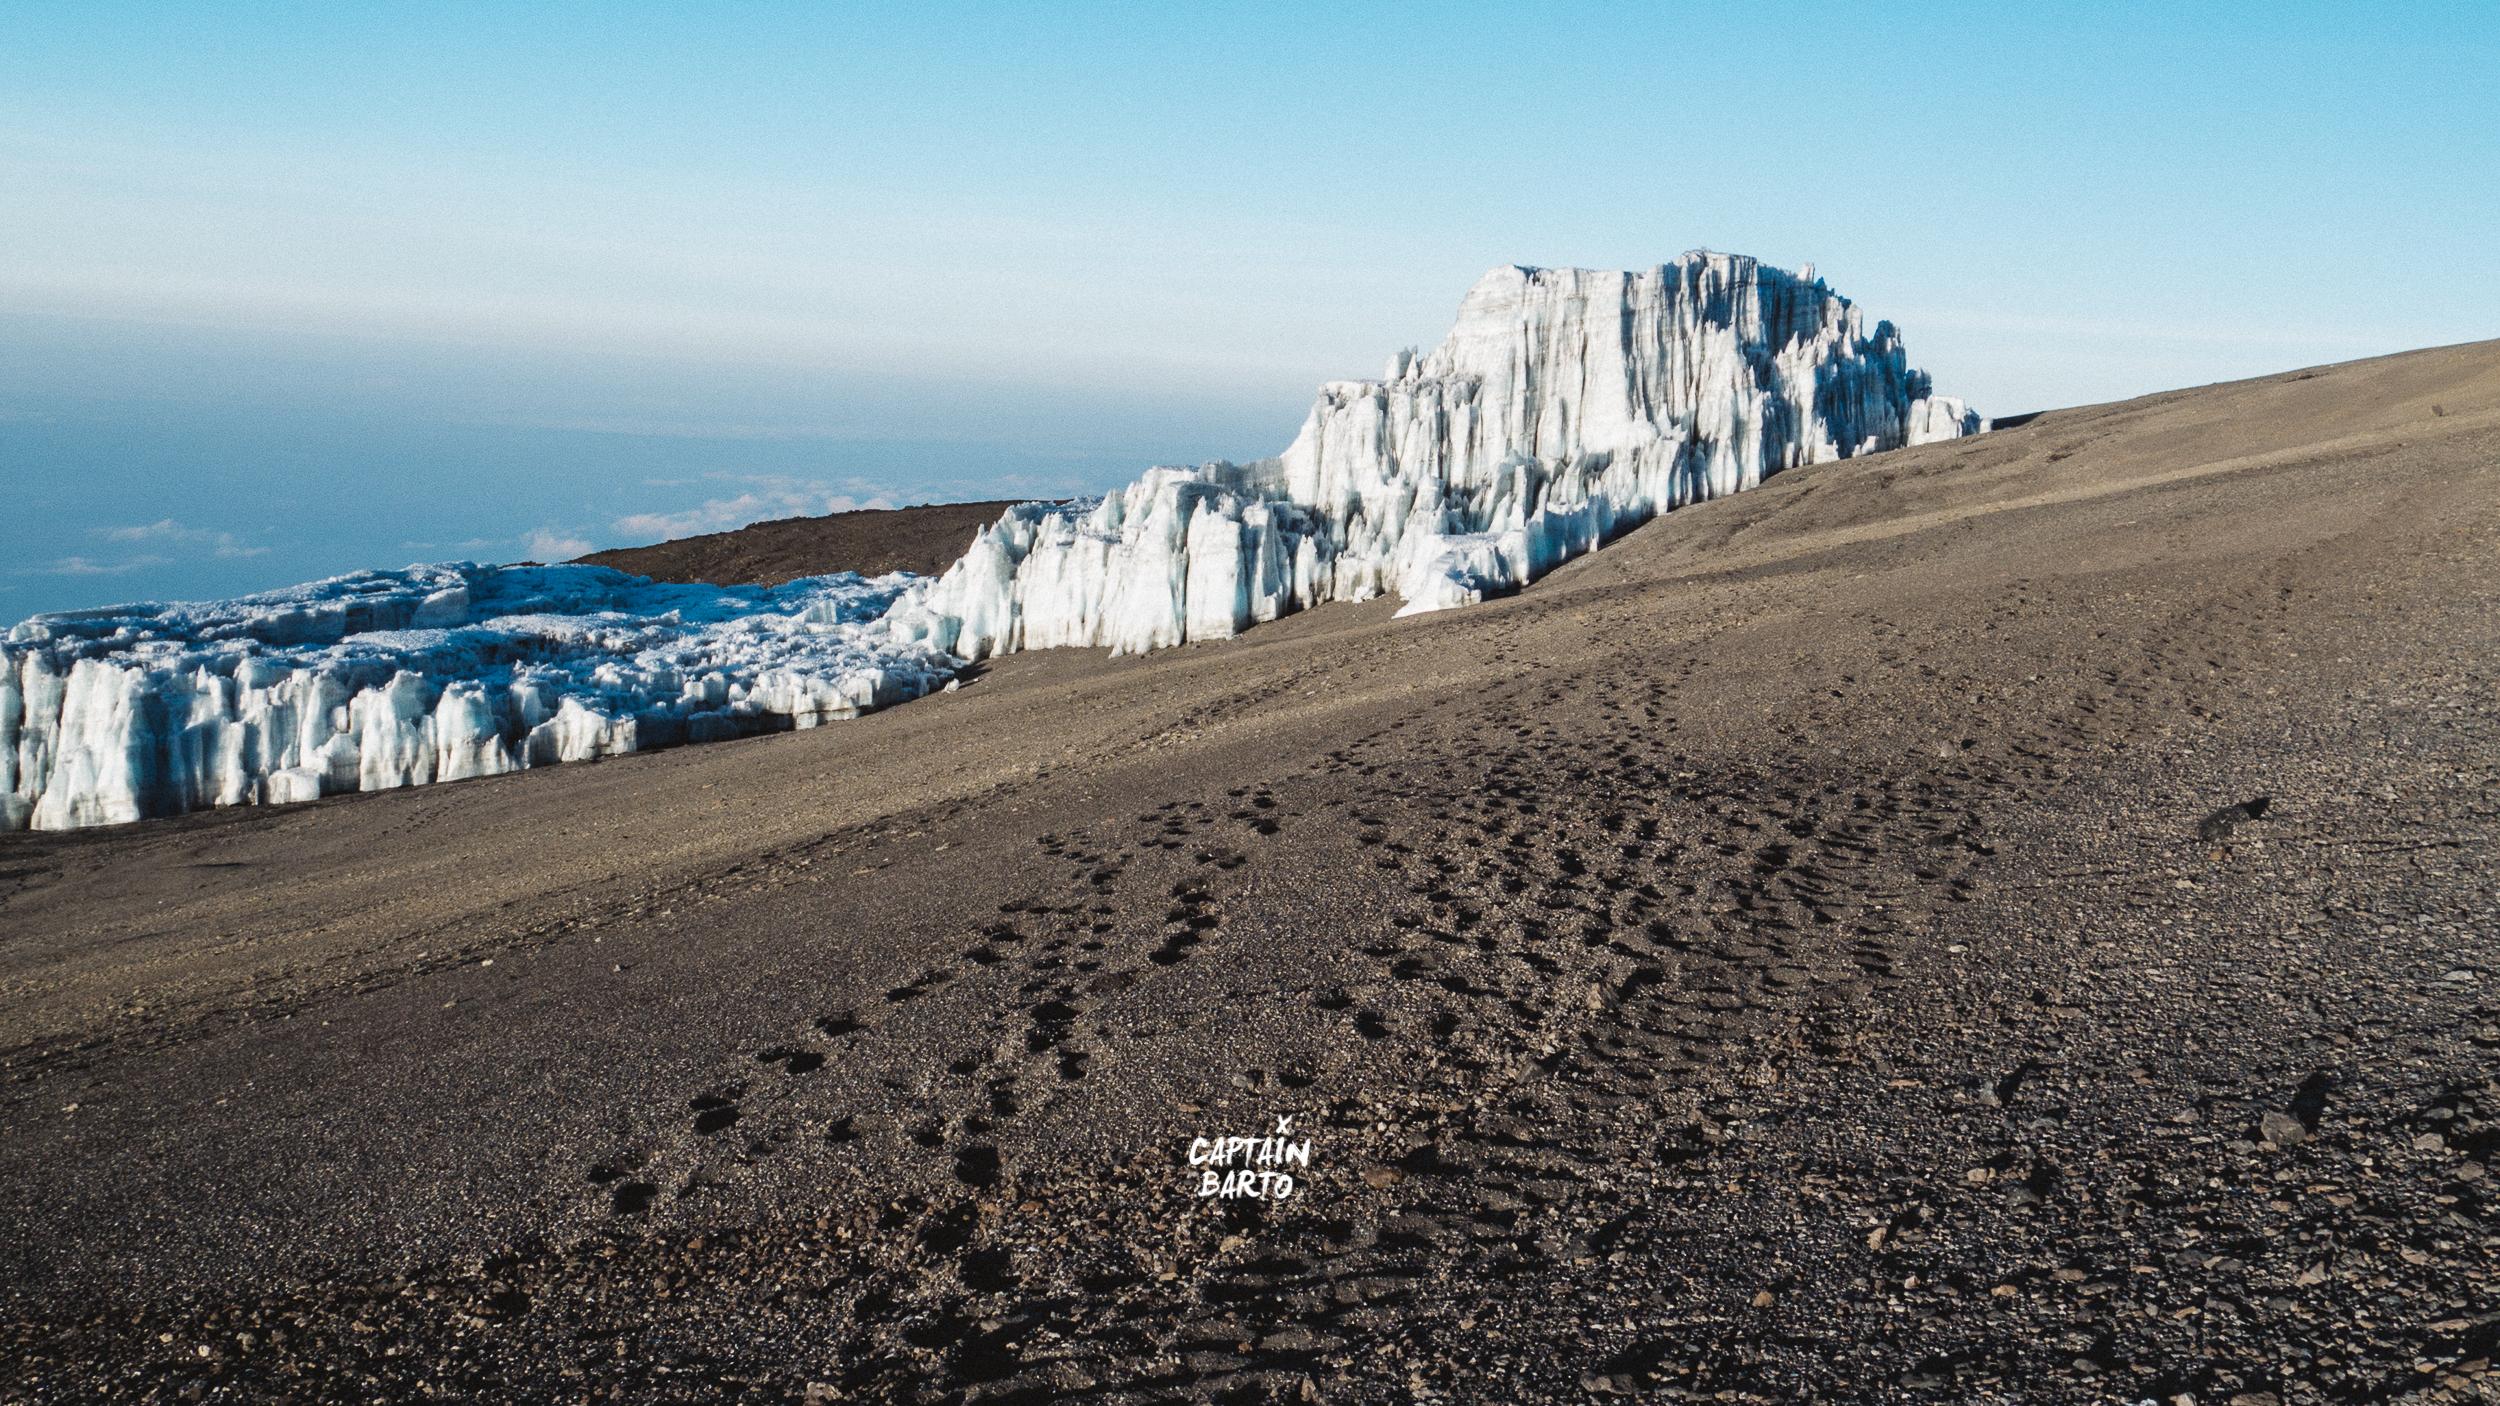 captainbarto-blog-wallpaper-climbing-mtkilimanjaro-110817-5.jpg